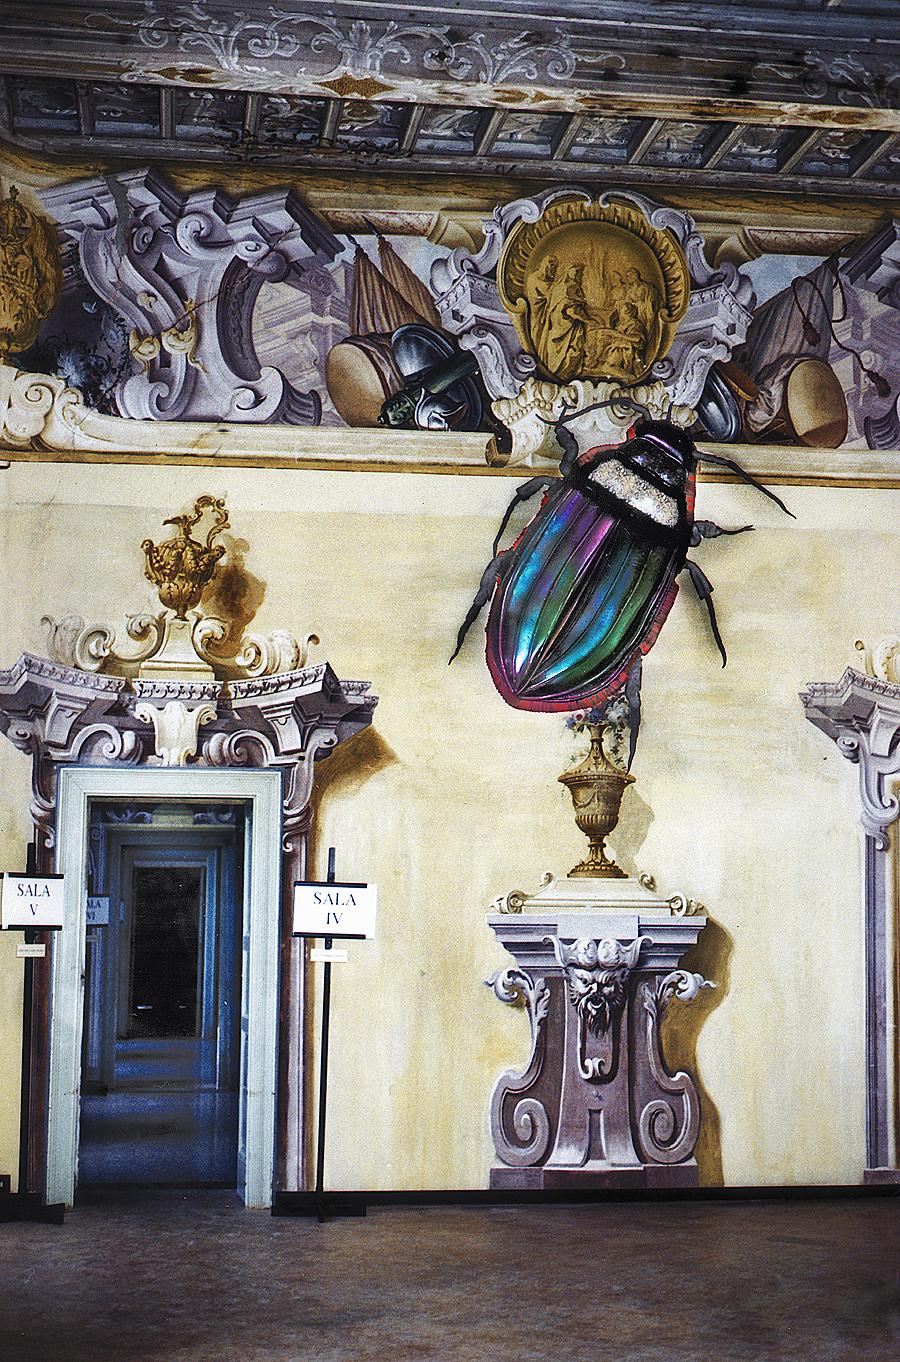 museo-di-storia-innaturale-sala-iv-le-pelli-01-leptinus-ambientata-2-900